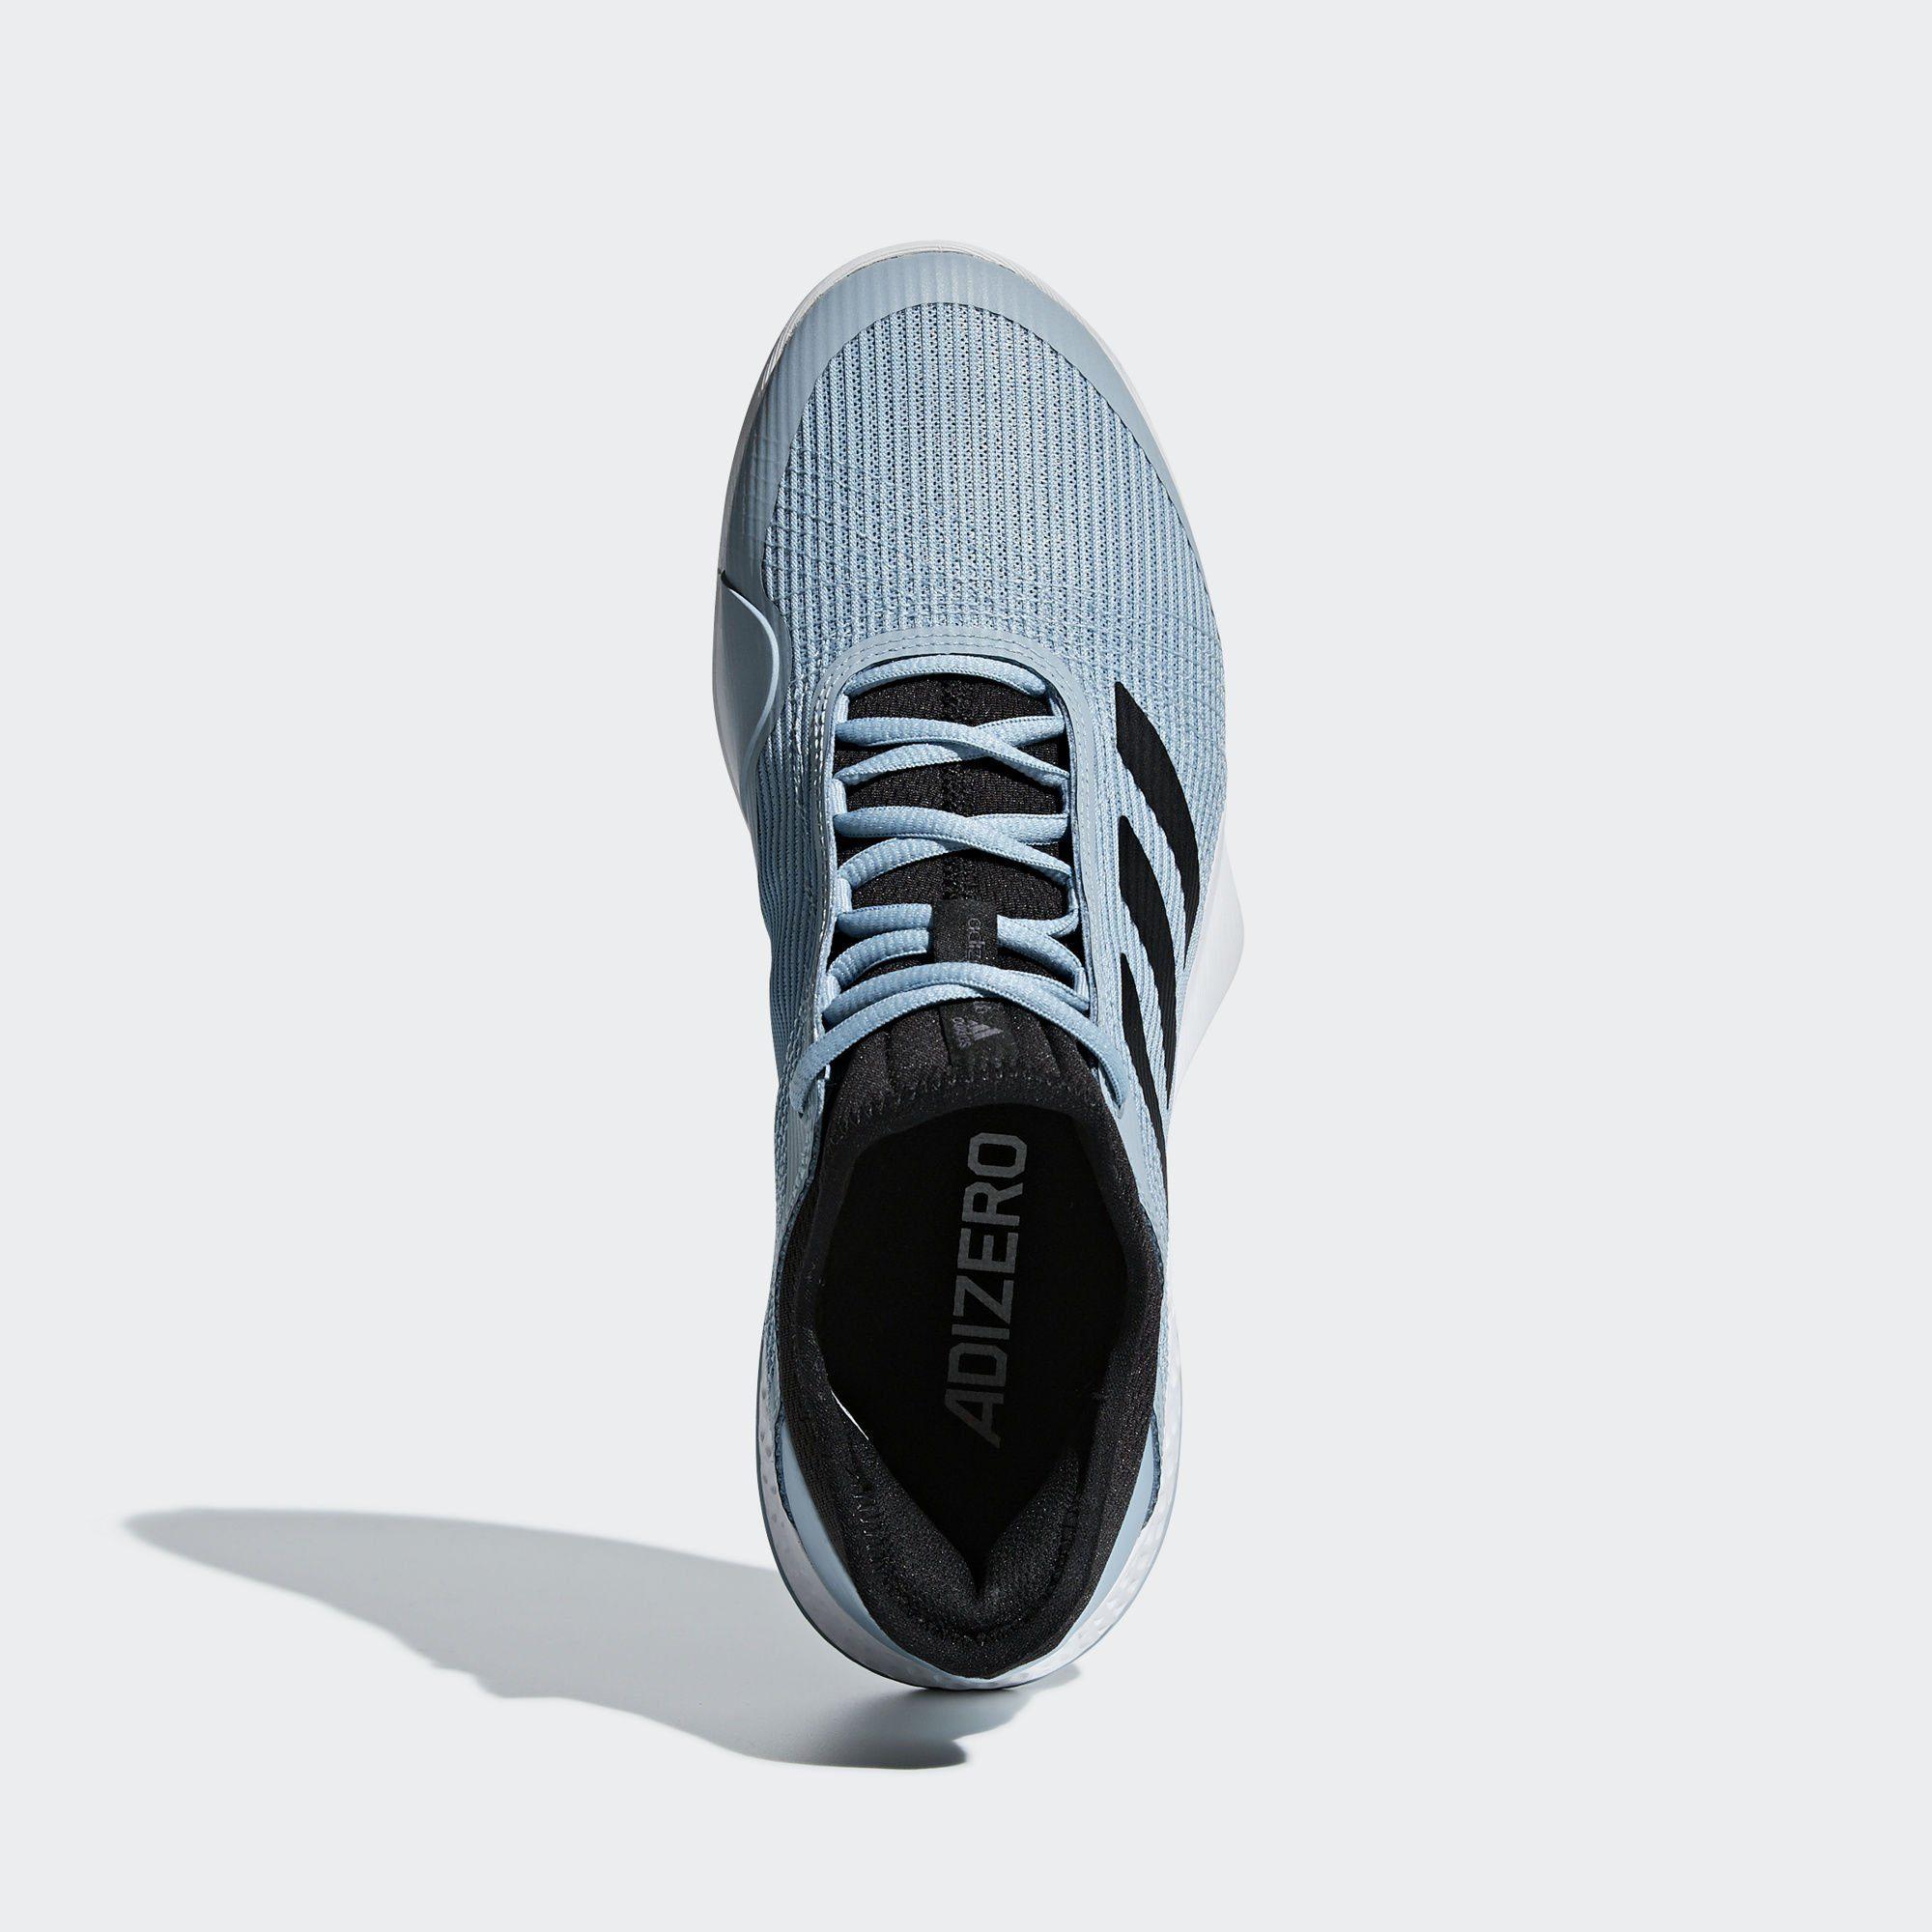 Fitnessschuh Adidas Performance Club »adizero Schuh« TIIv7z